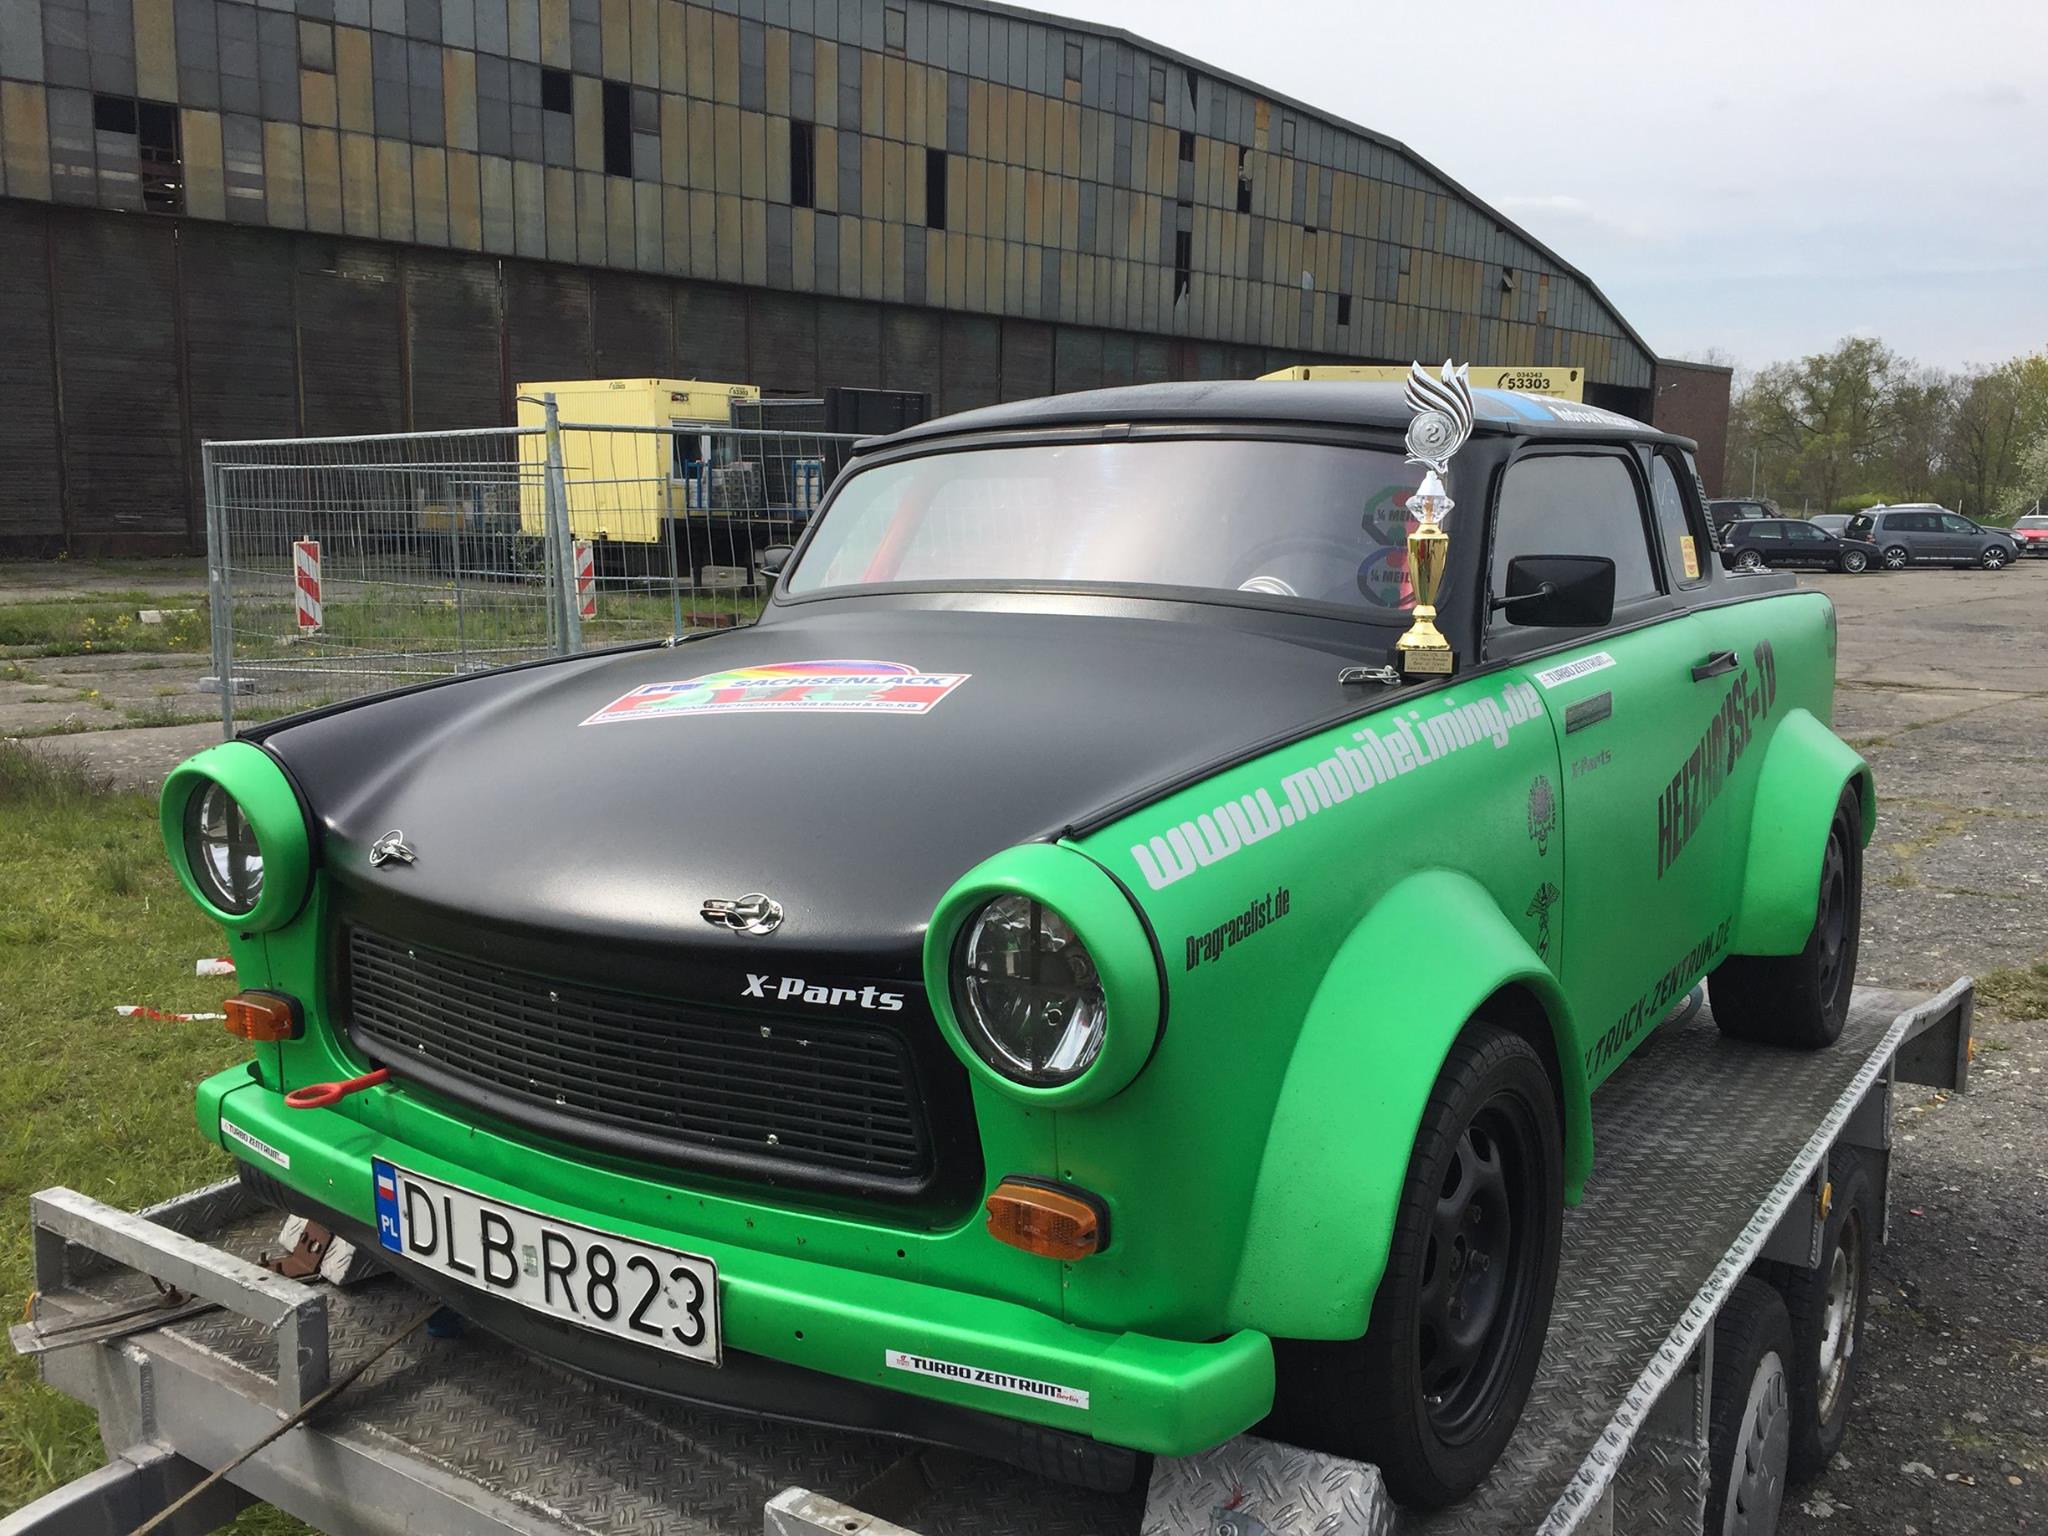 trabant 601 with a vw turbo diesel engine swap depot. Black Bedroom Furniture Sets. Home Design Ideas